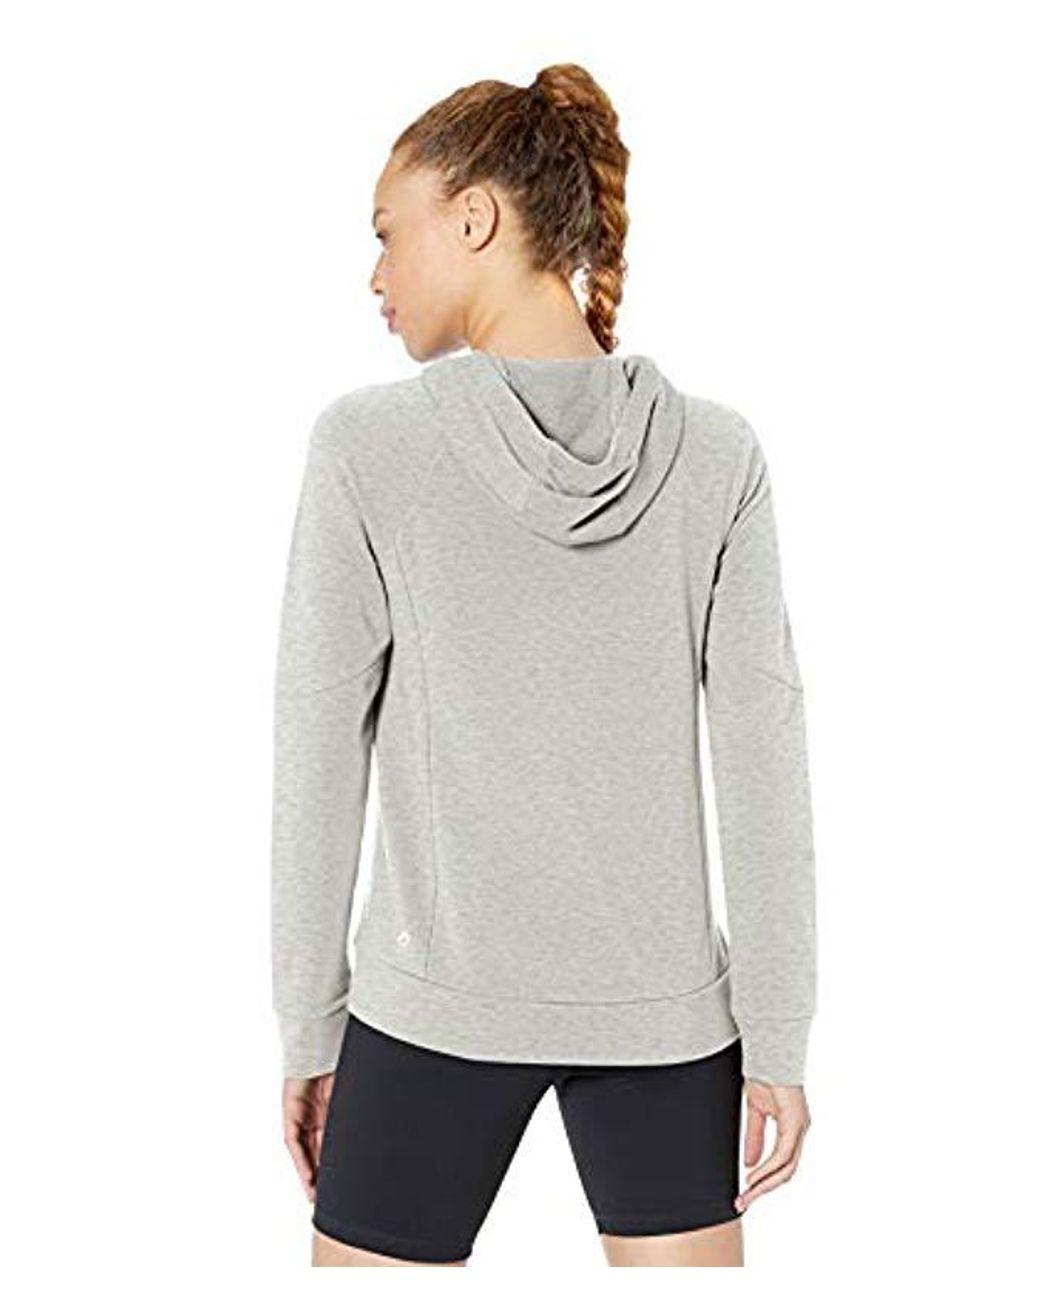 Soft Cotton Modal French Terry Fleece Workout Hoodie Sweatshirt Brand XS-3X Core 10 Womens